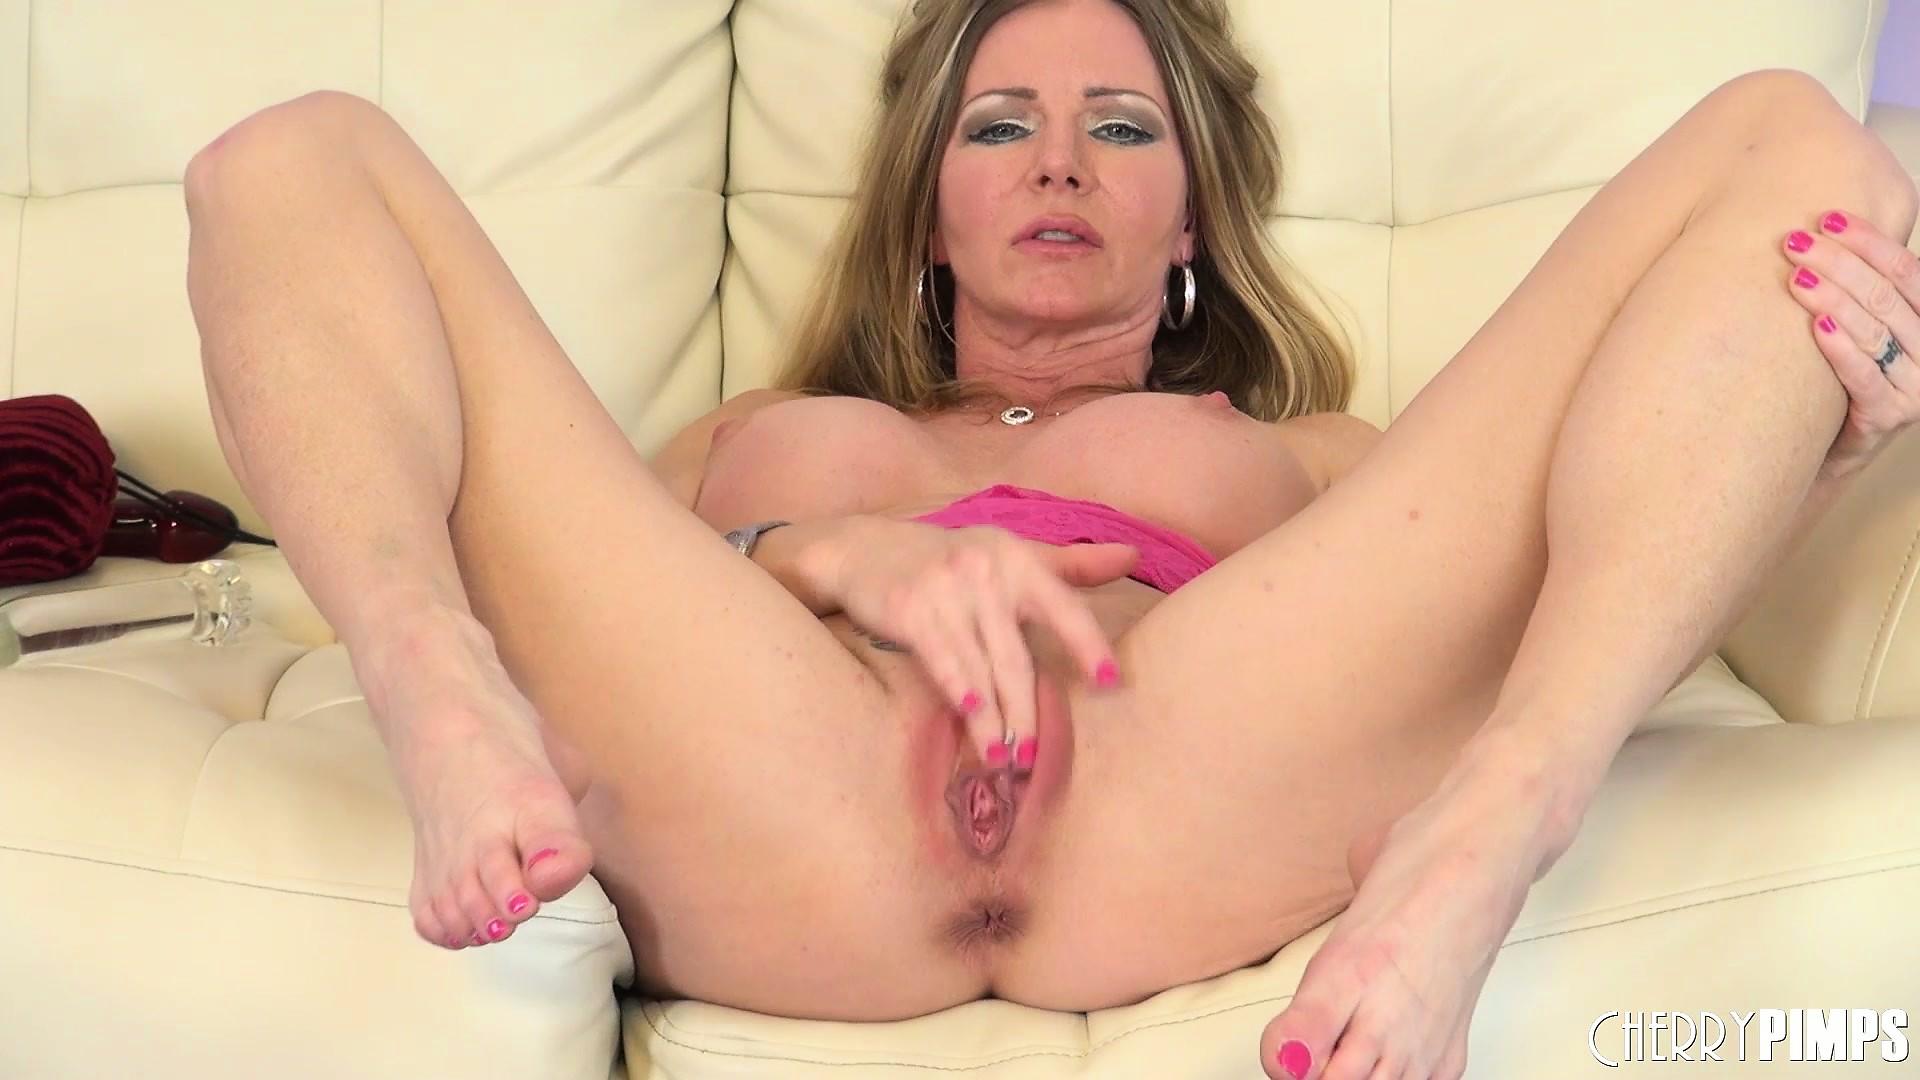 enjoy free hd porn videos - amber michaels has got her legs wide